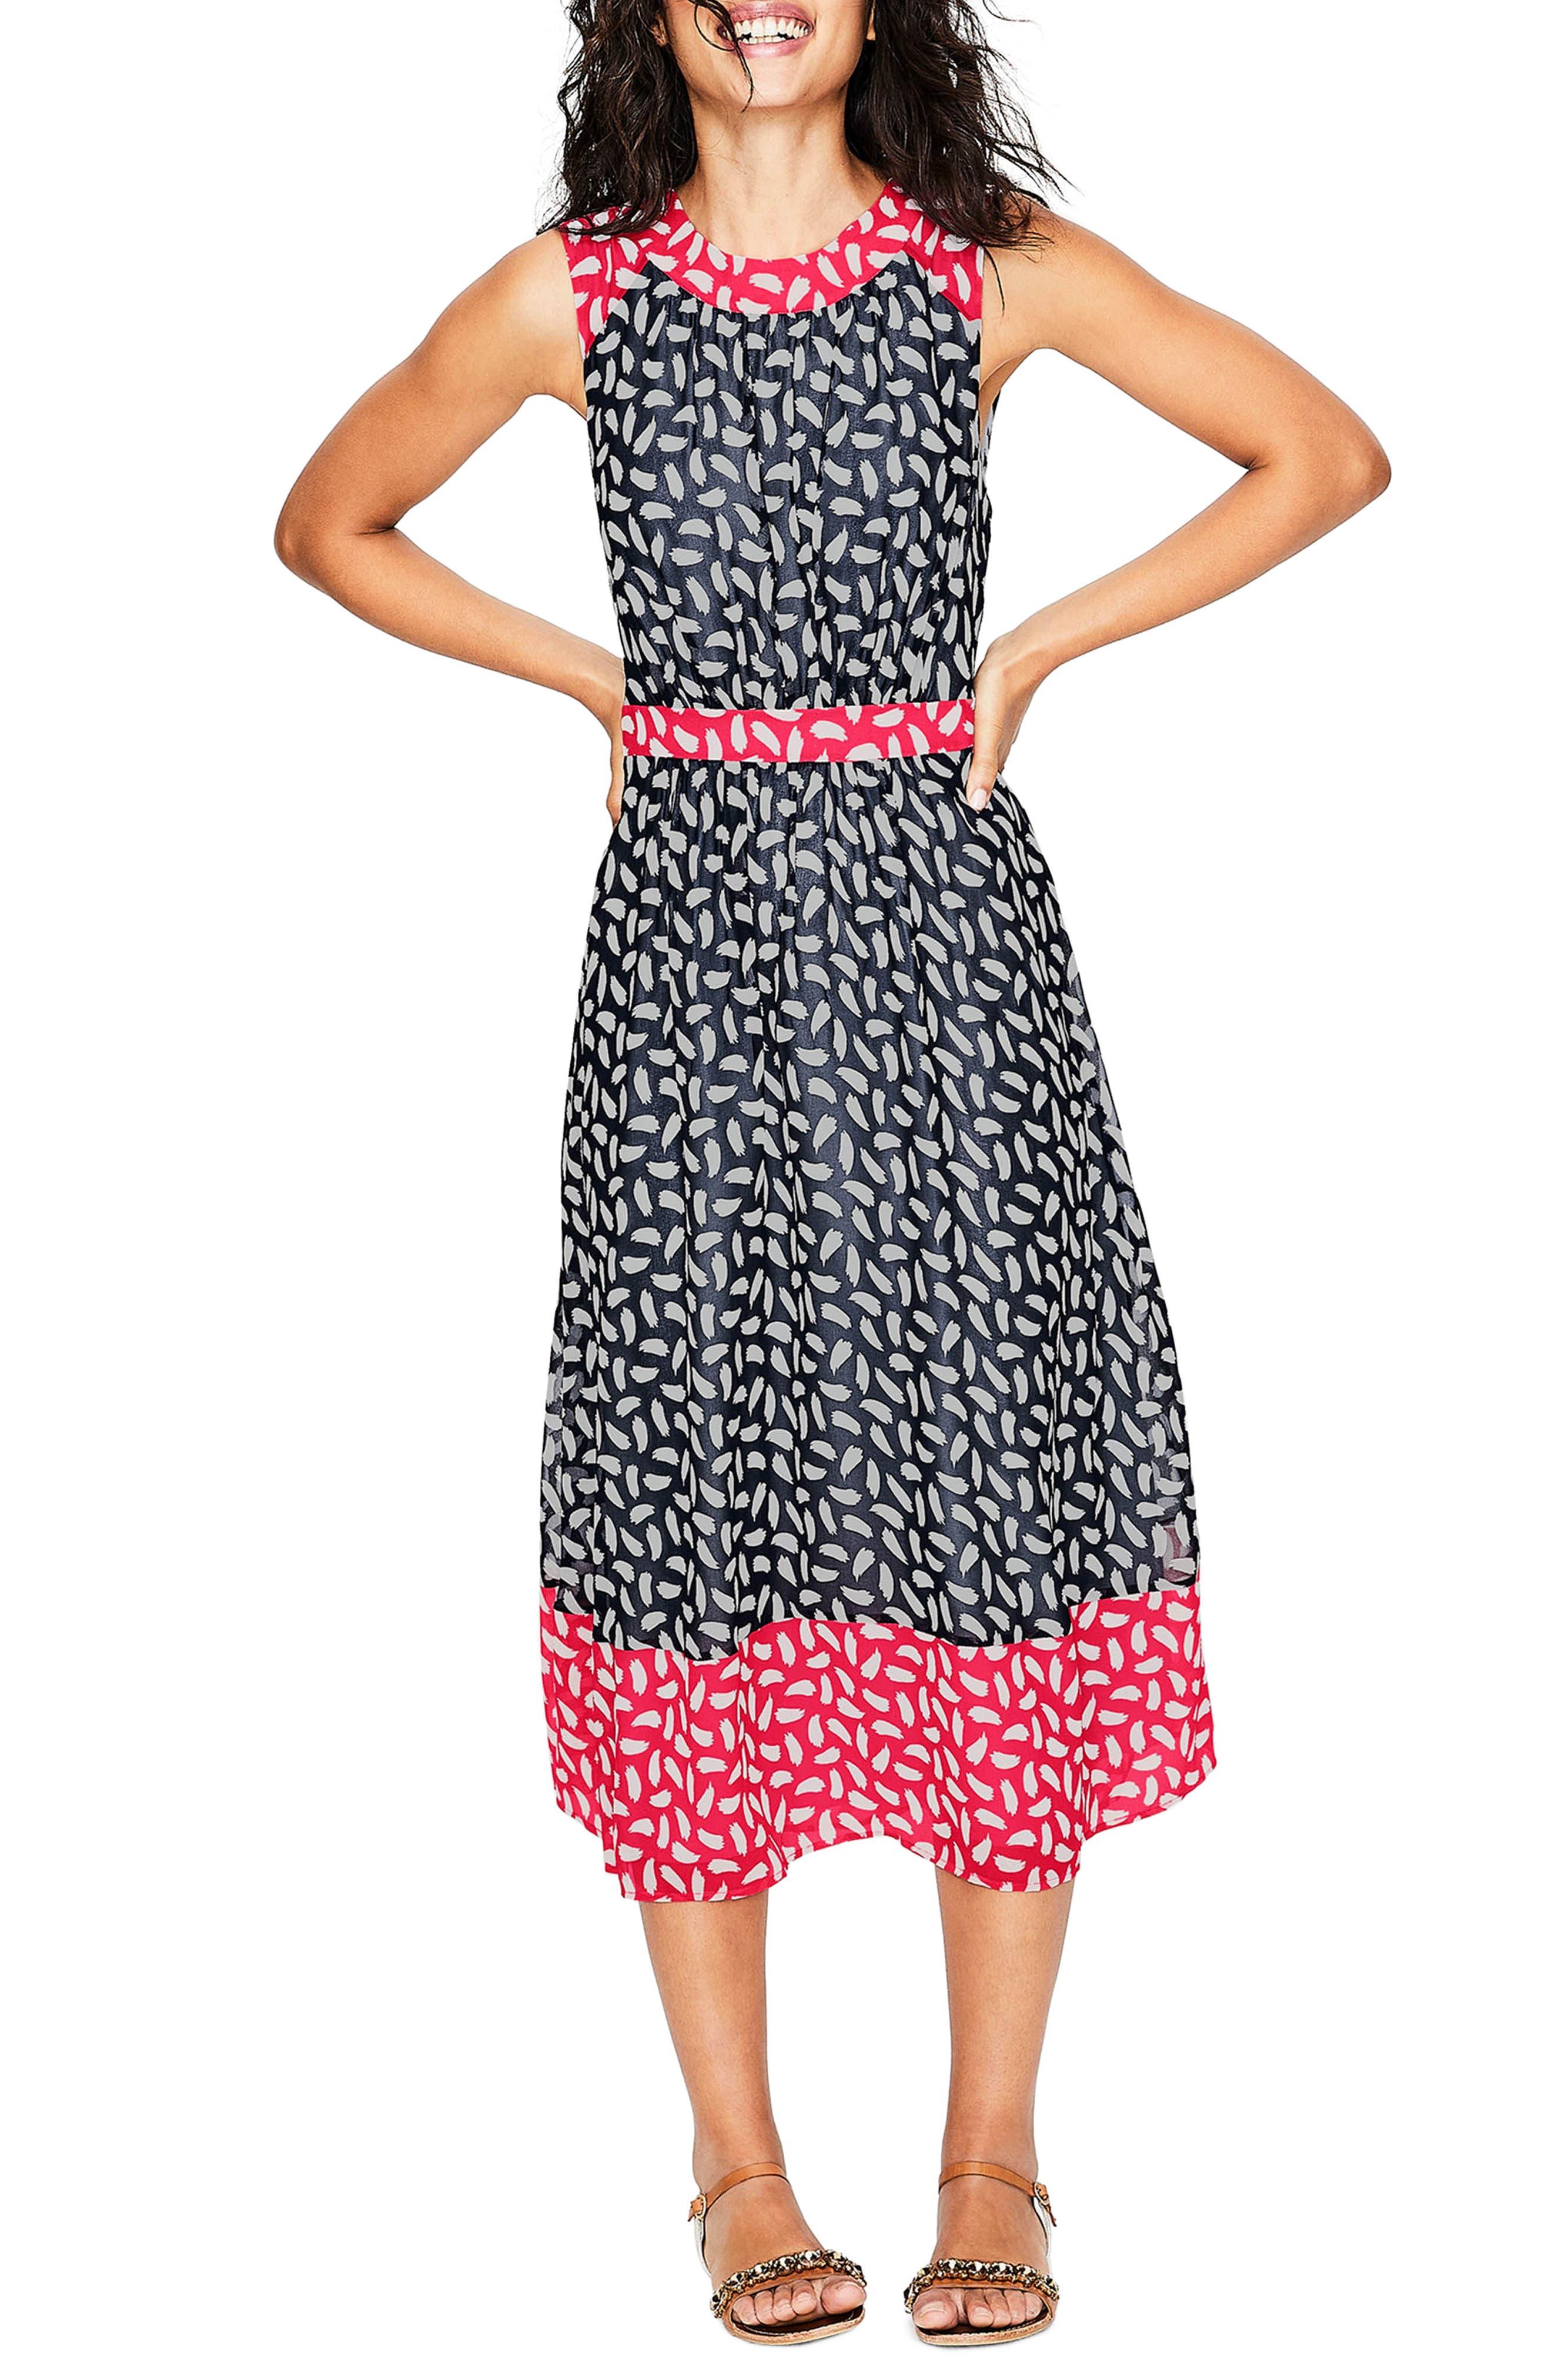 BODEN,                             Sylvie Print Sleeveless Dress,                             Main thumbnail 1, color,                             414